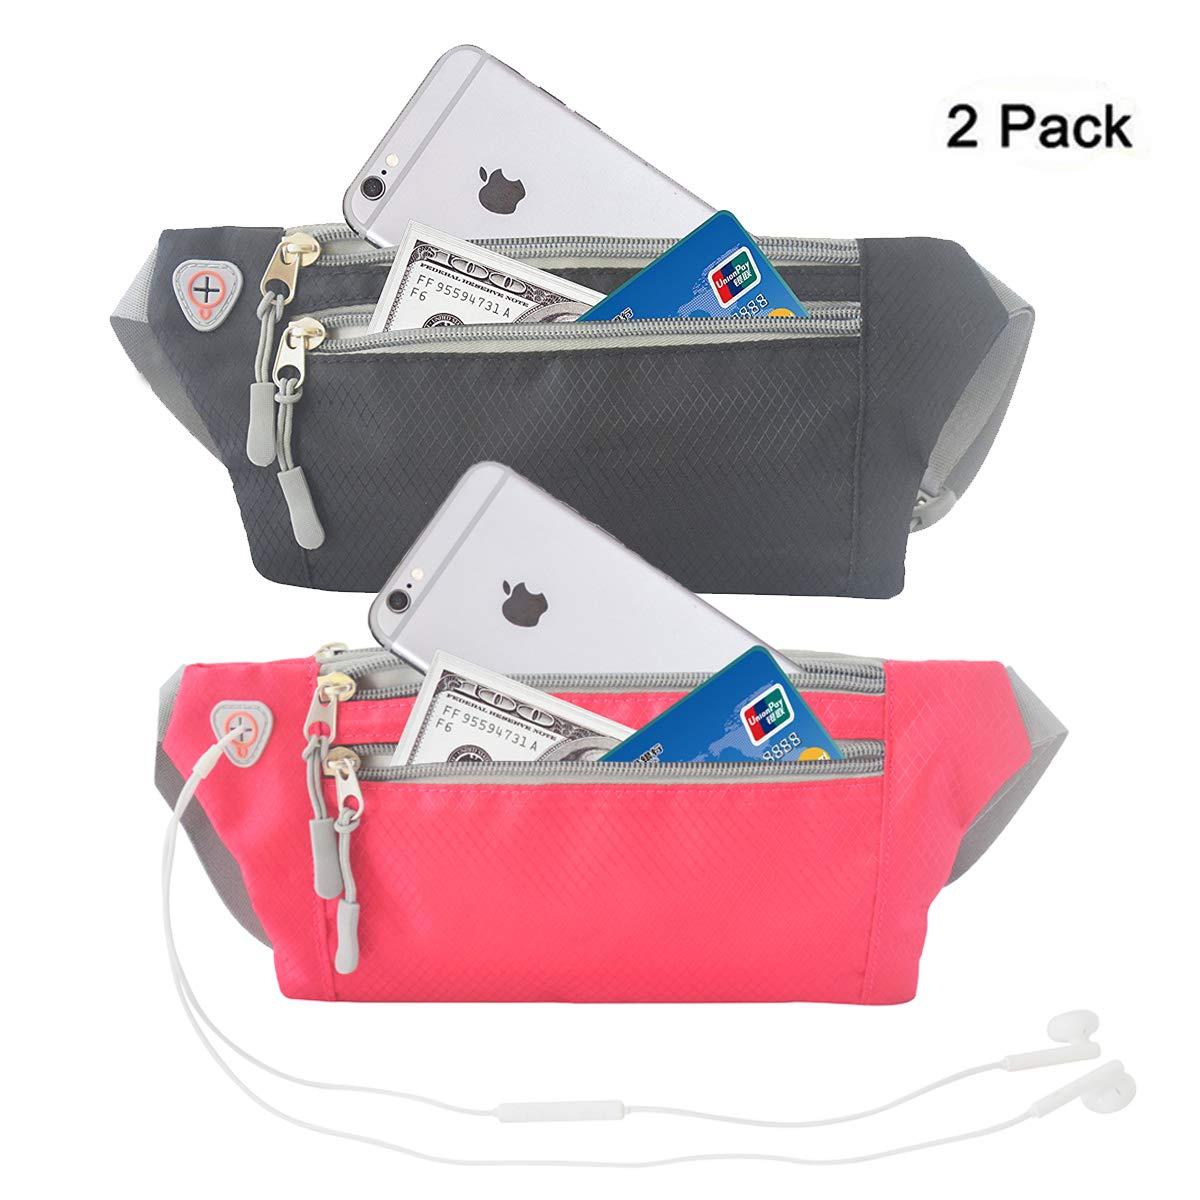 veriya Waist Pack Bum Bag,Waterproof Waistpack Lightweight Fanny Pack Bag with Headphone Jack for Running Hiking Cycling Dog Walking 5.5'' smartphoe Money Coins Keys Passport Holder (Black Fuschia)